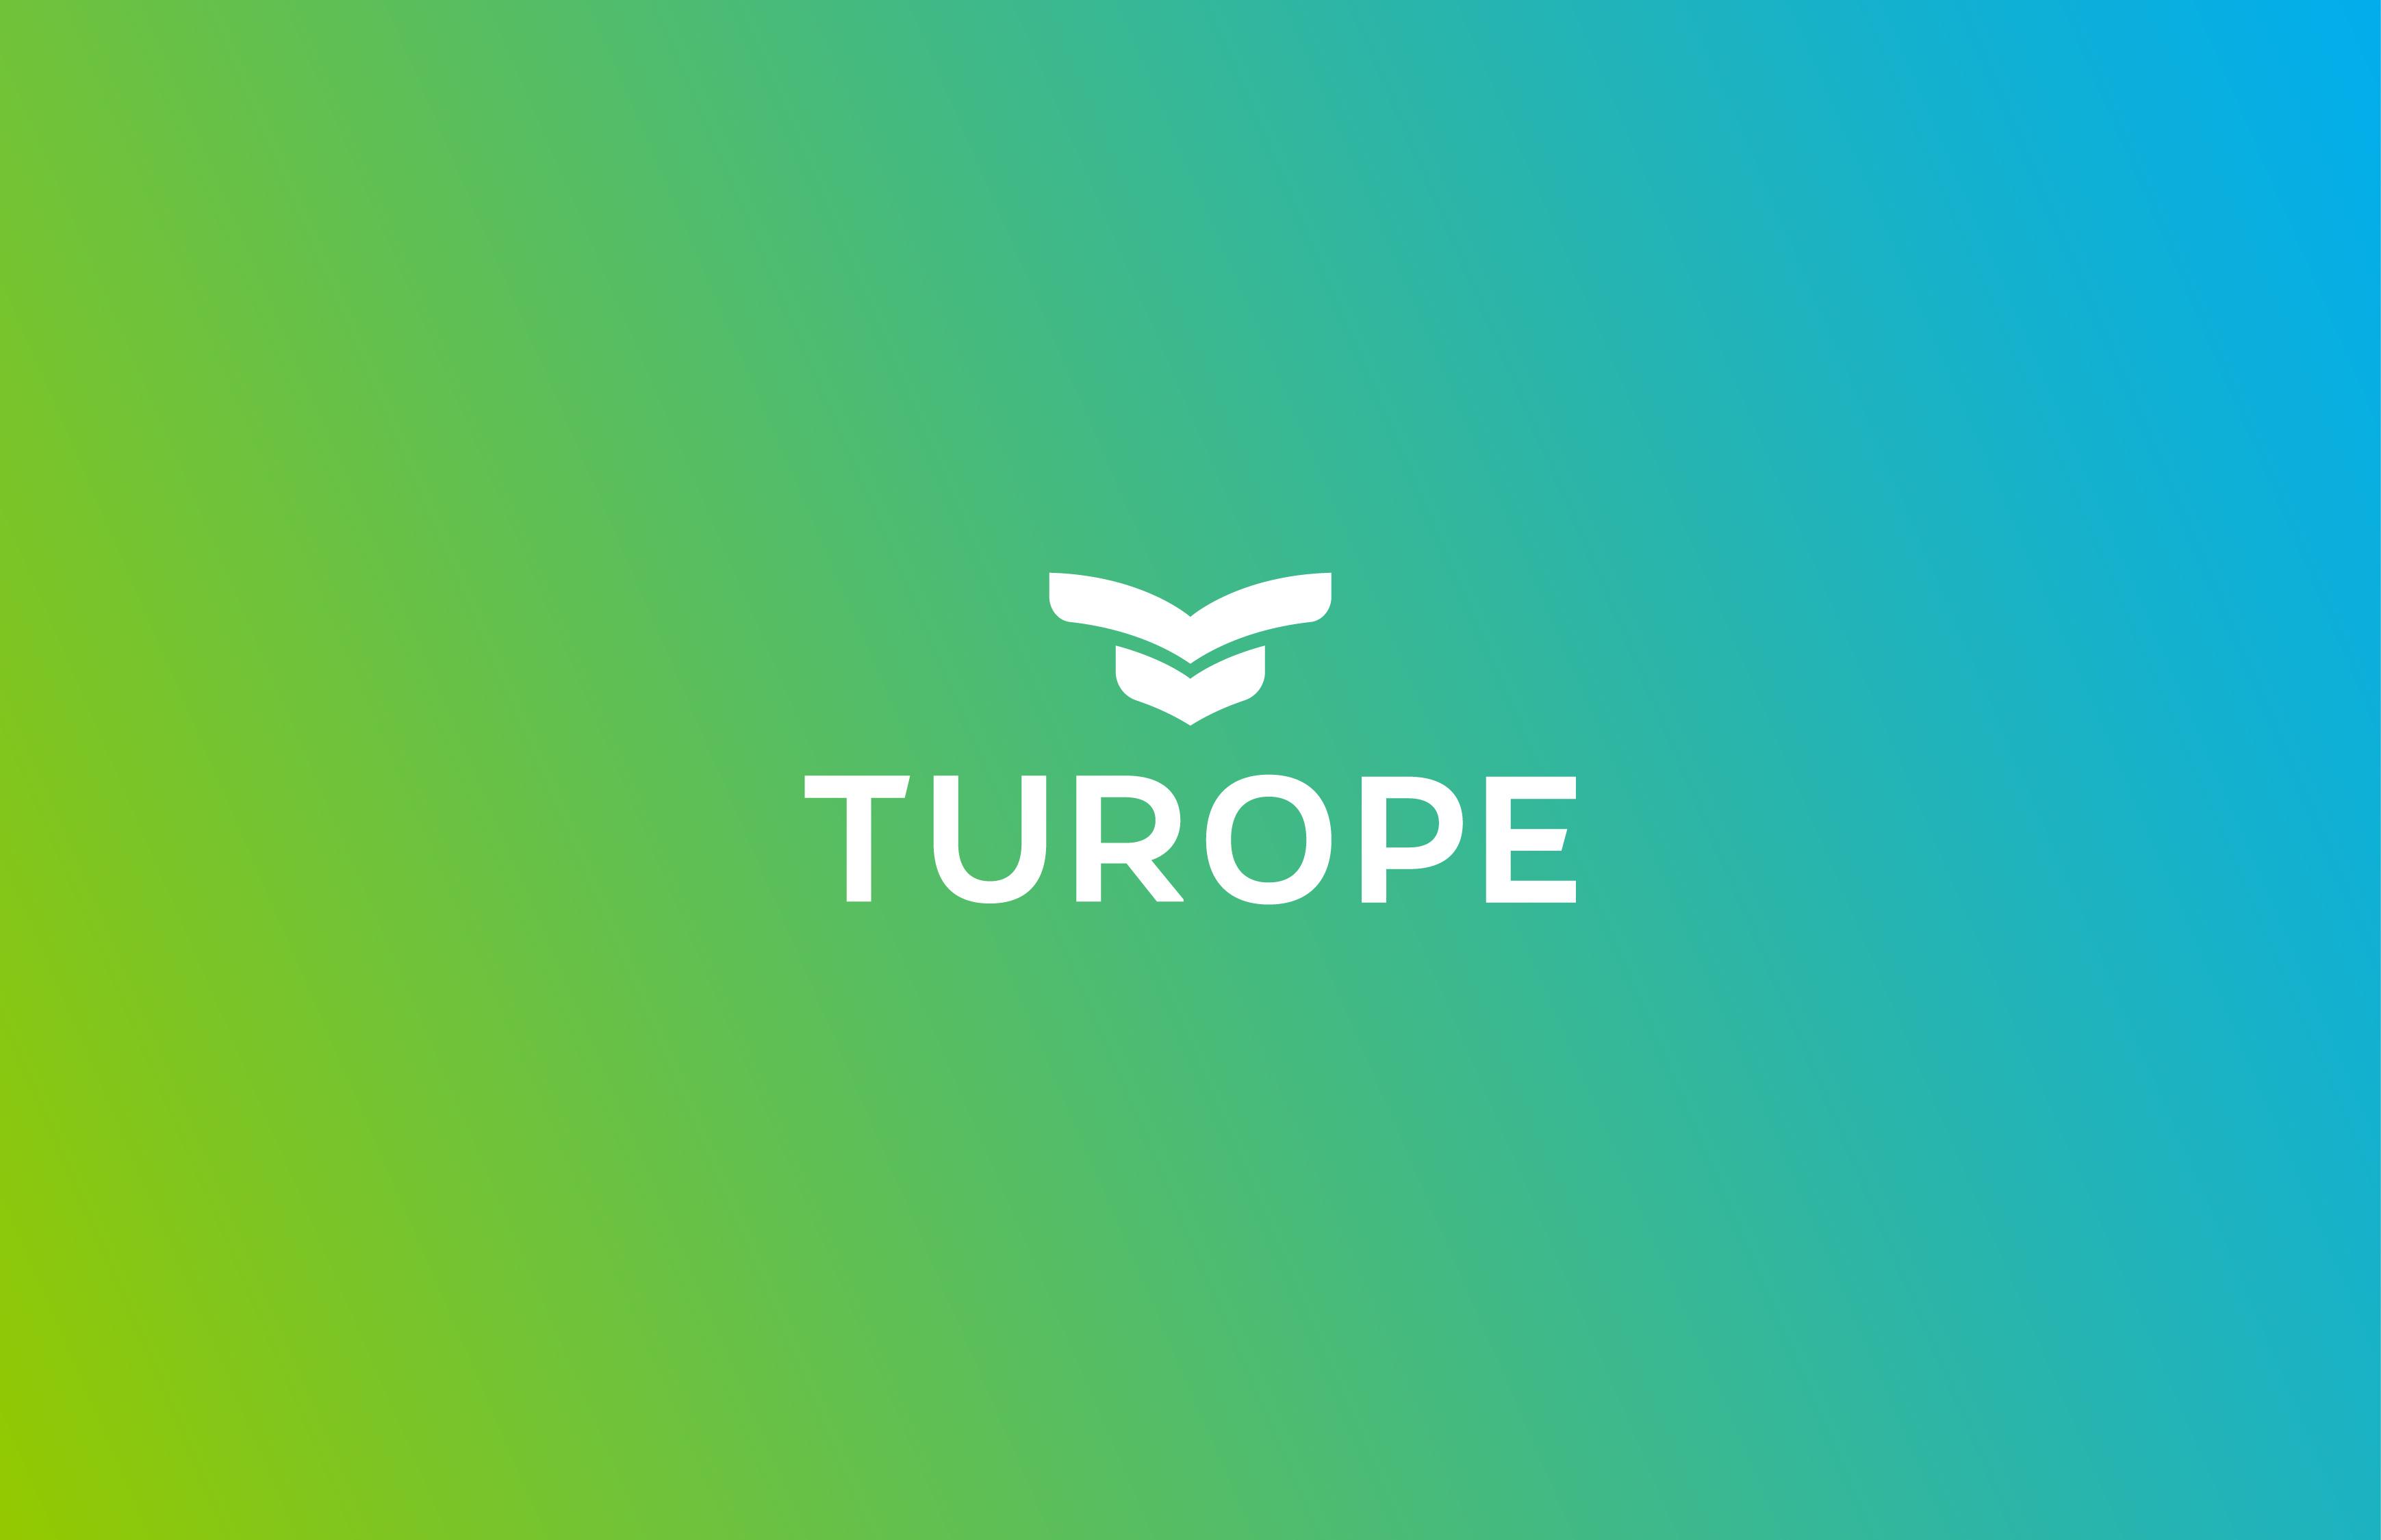 Belli Creative Studio Created the Brand Look of the Turope Company